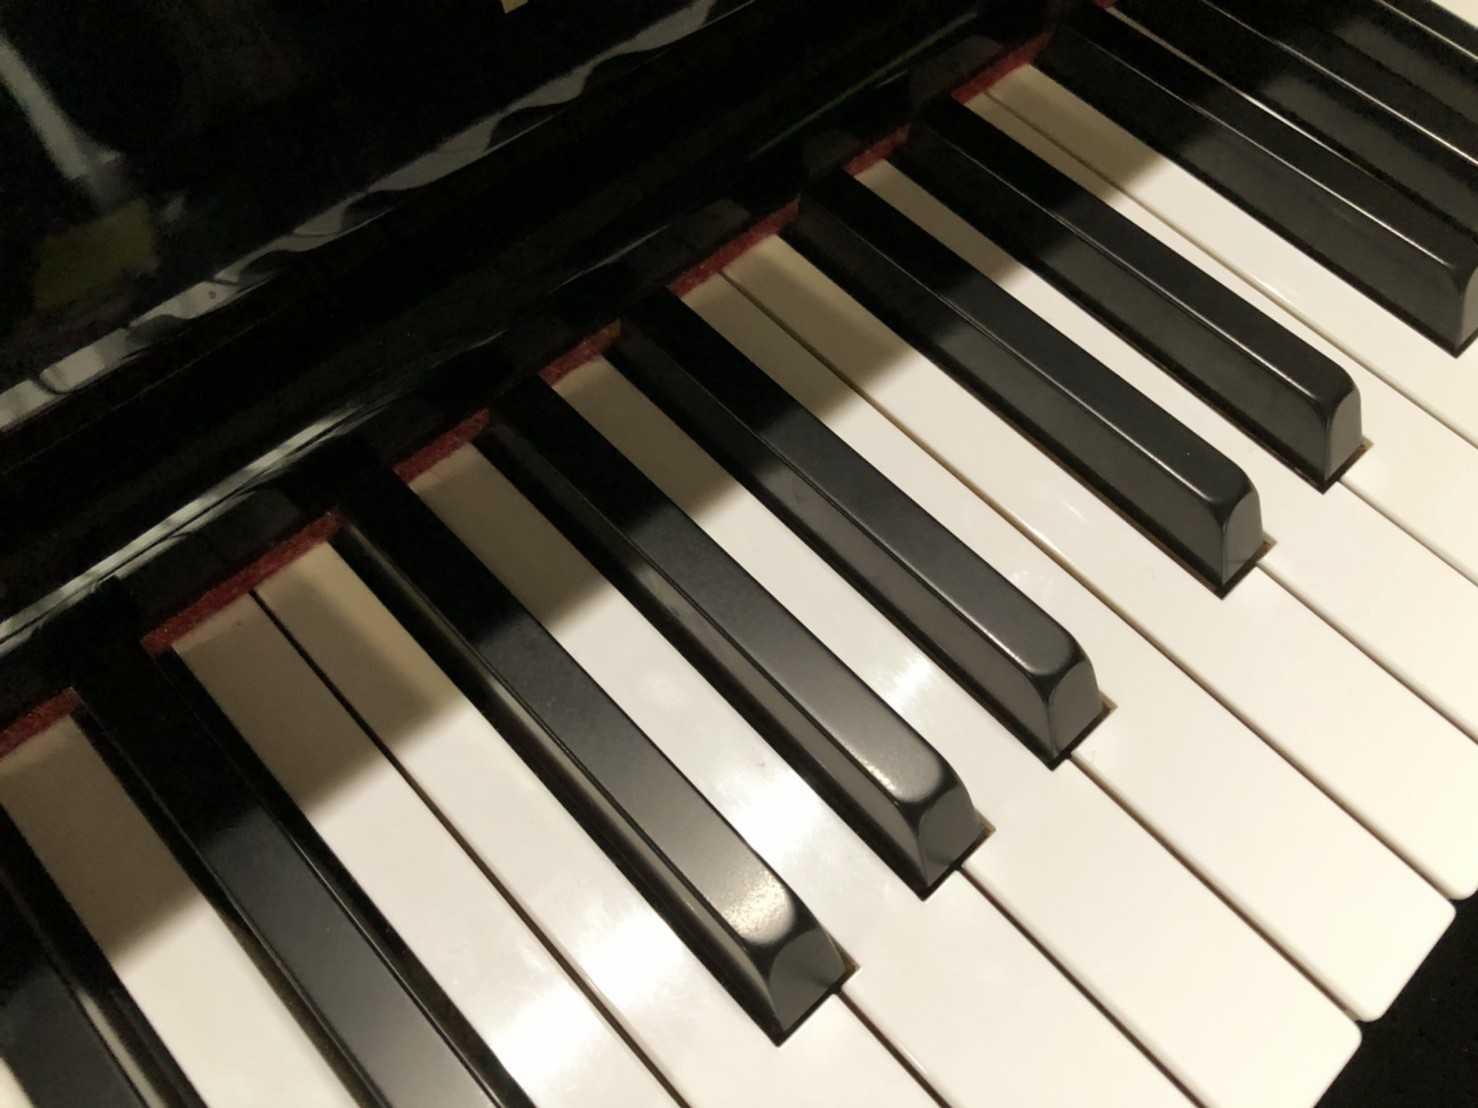 PianoLightの暖色の光で鍵盤を照らす